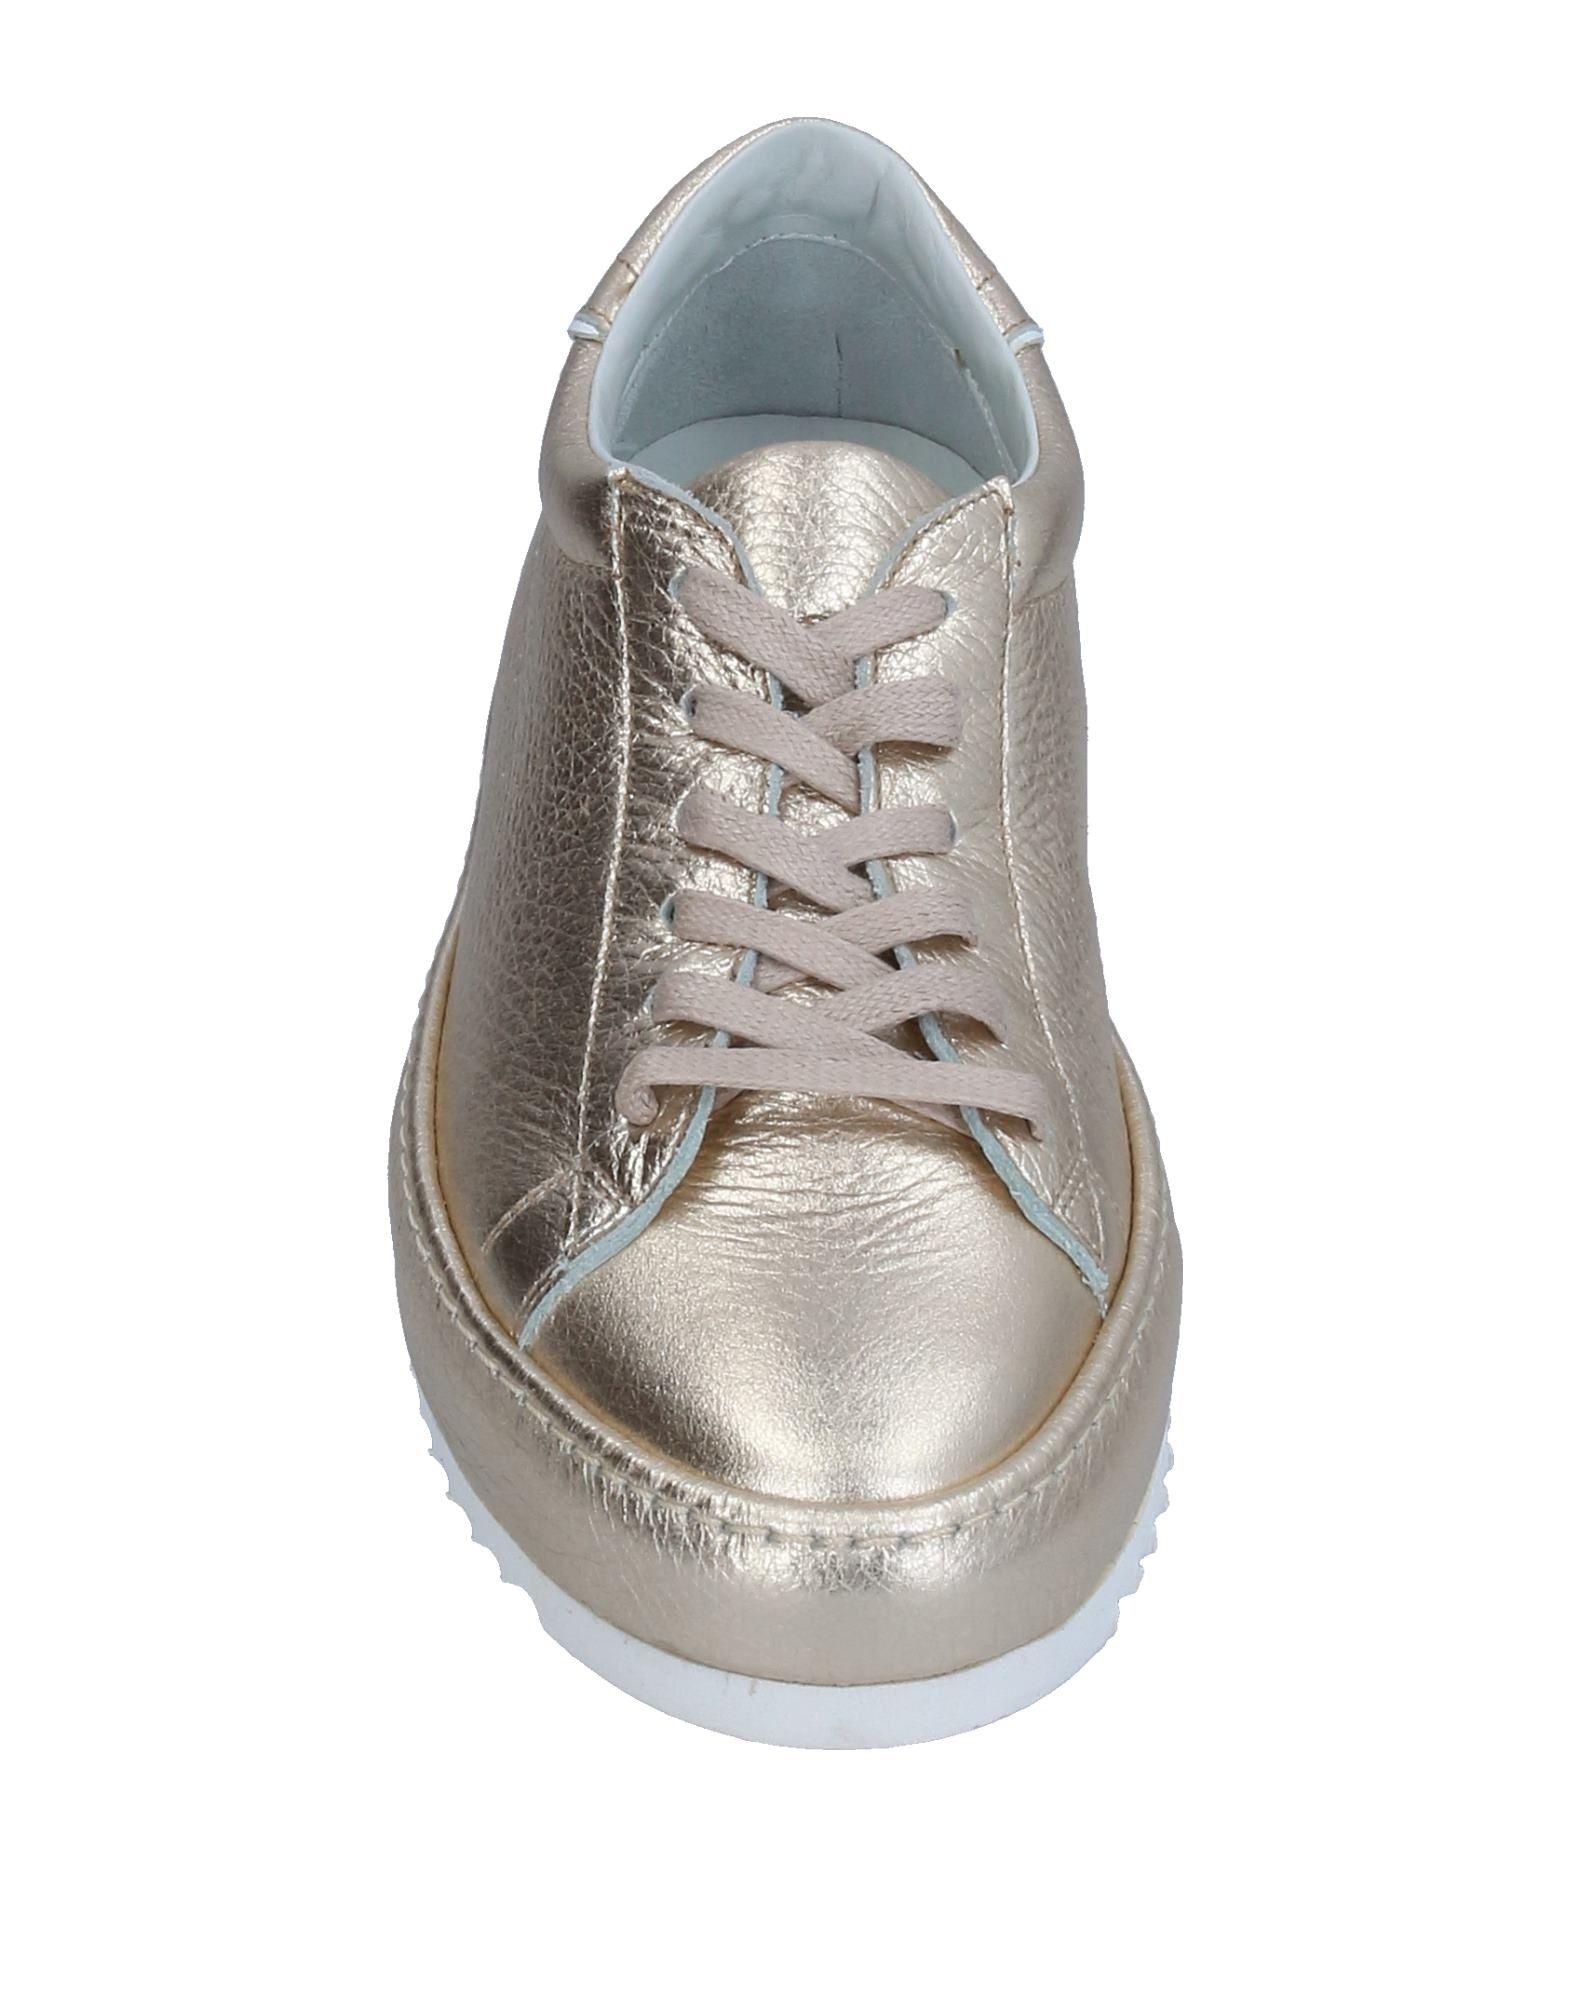 Stilvolle billige Sneakers Schuhe Philippe Model Sneakers billige Damen  11341198VG 6afe39